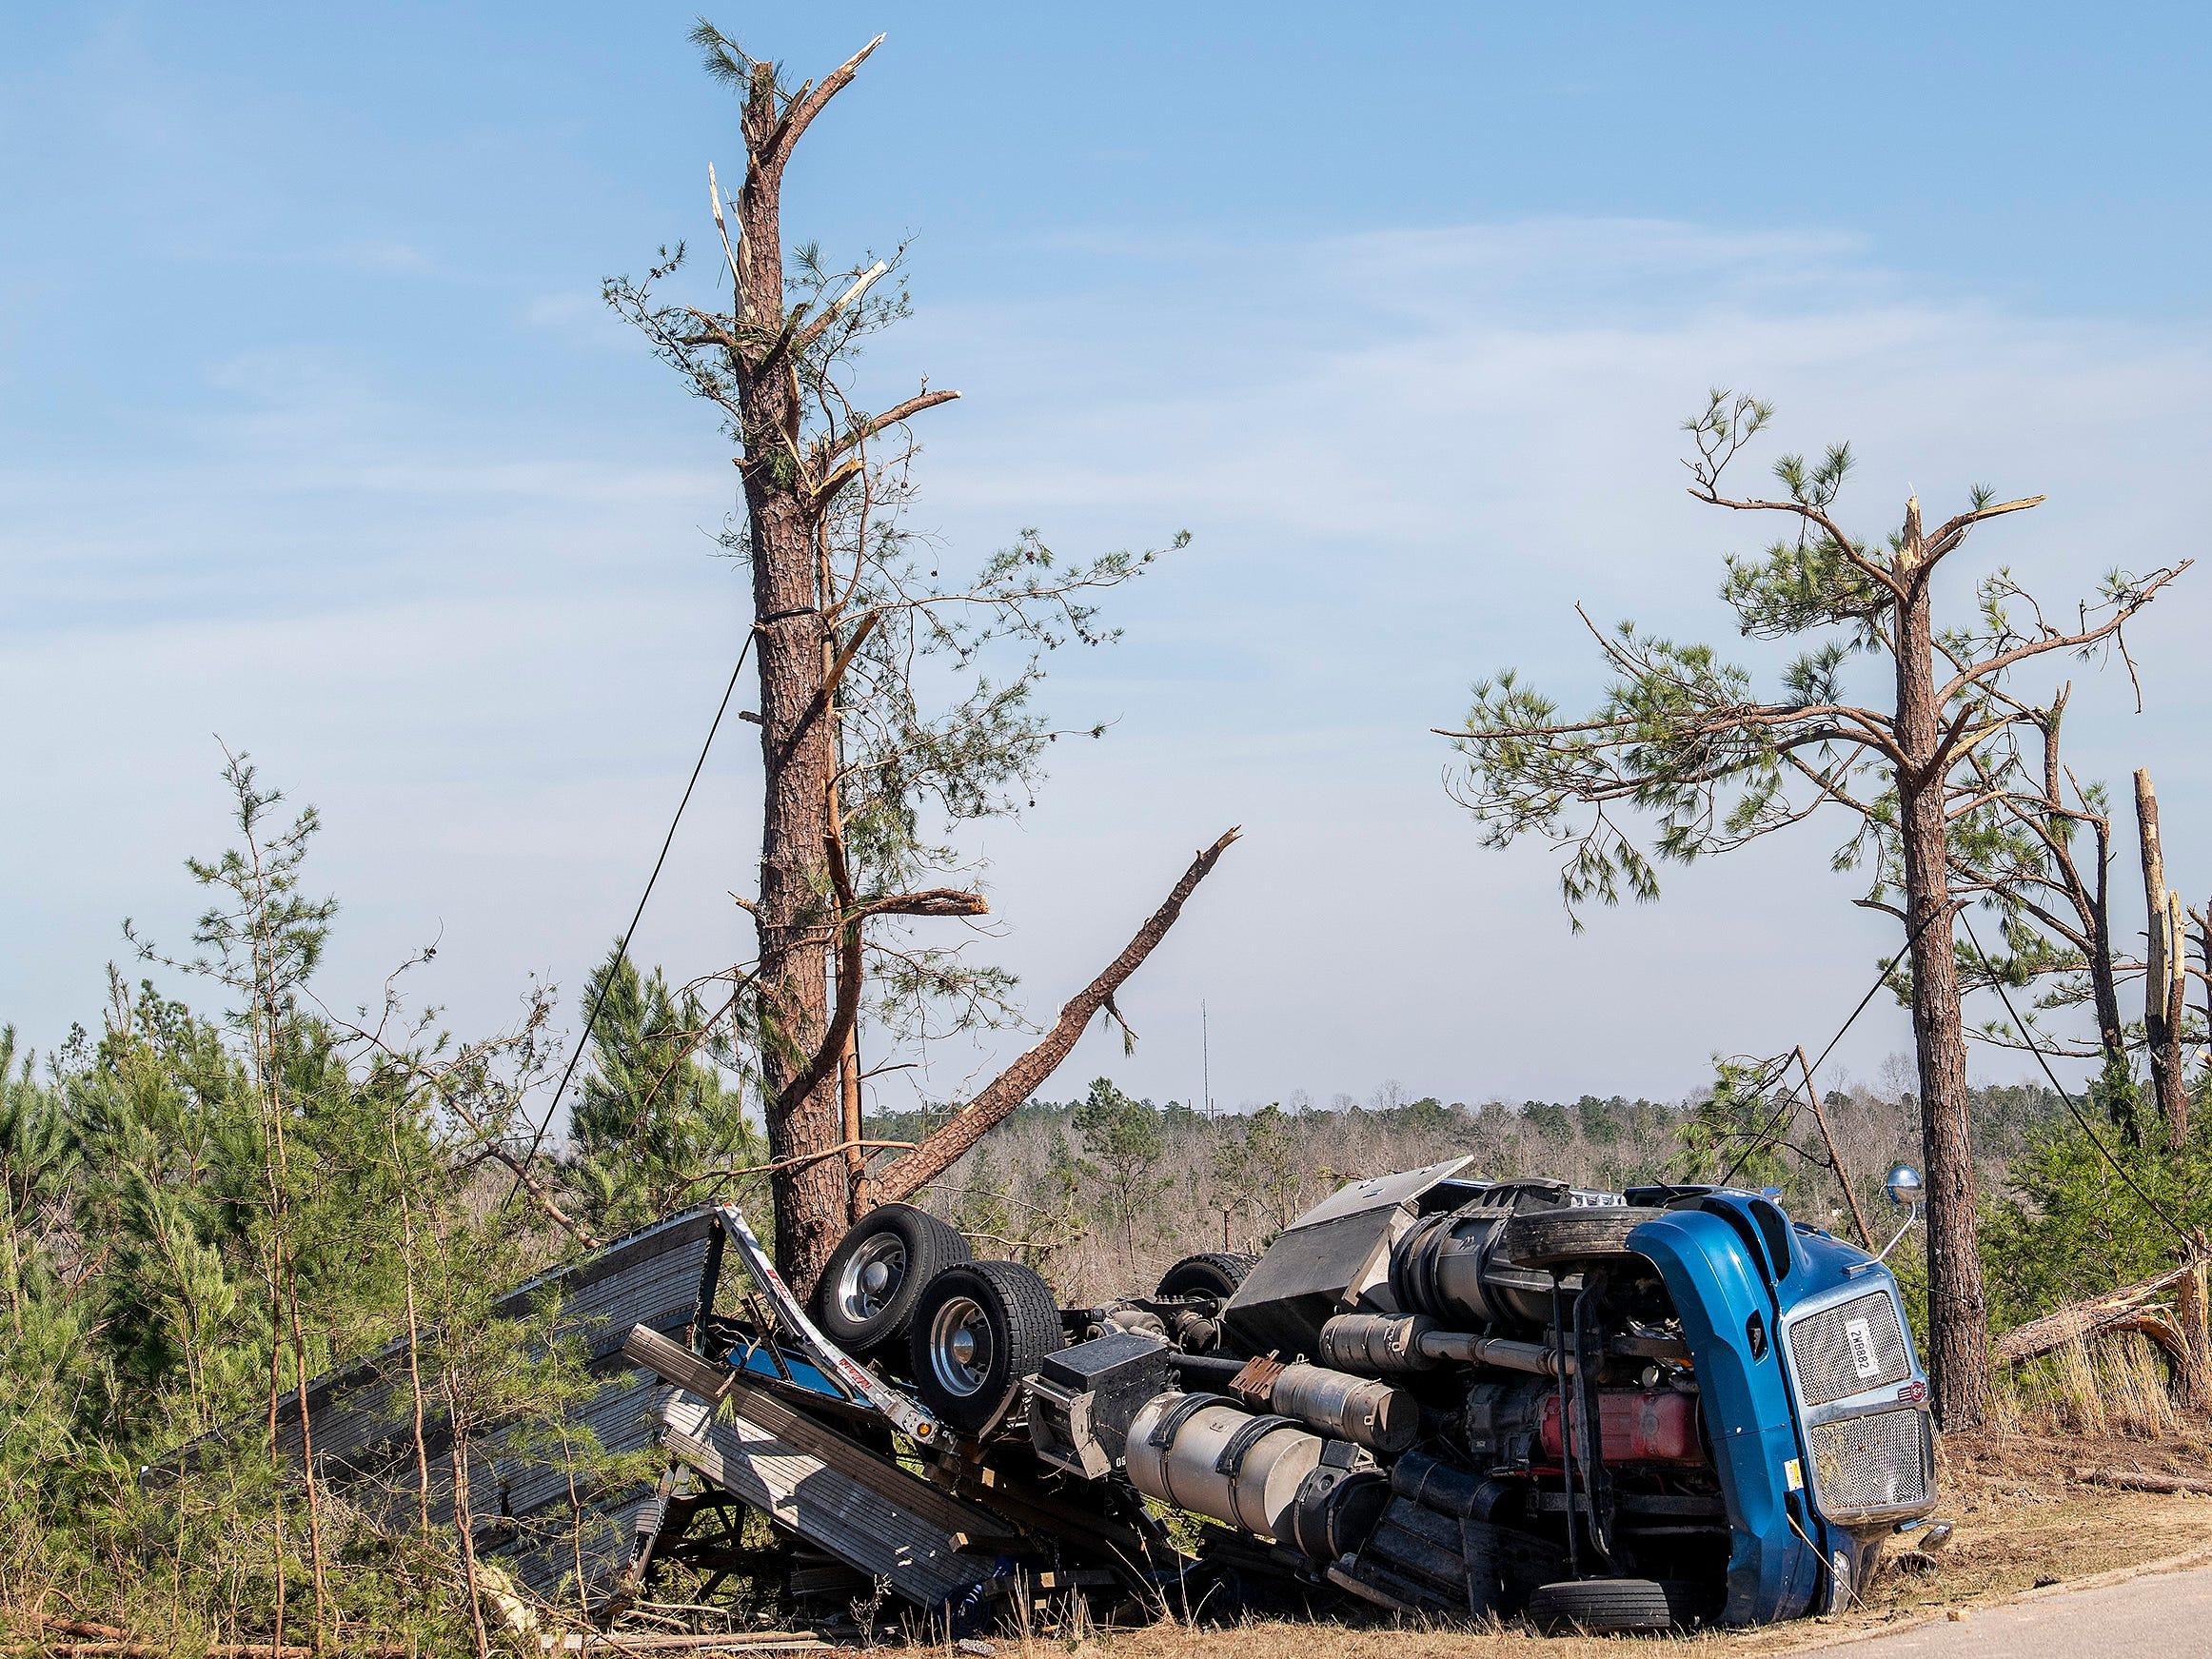 Tornado damage in Beauregard, Ala. on March 7, 2019.